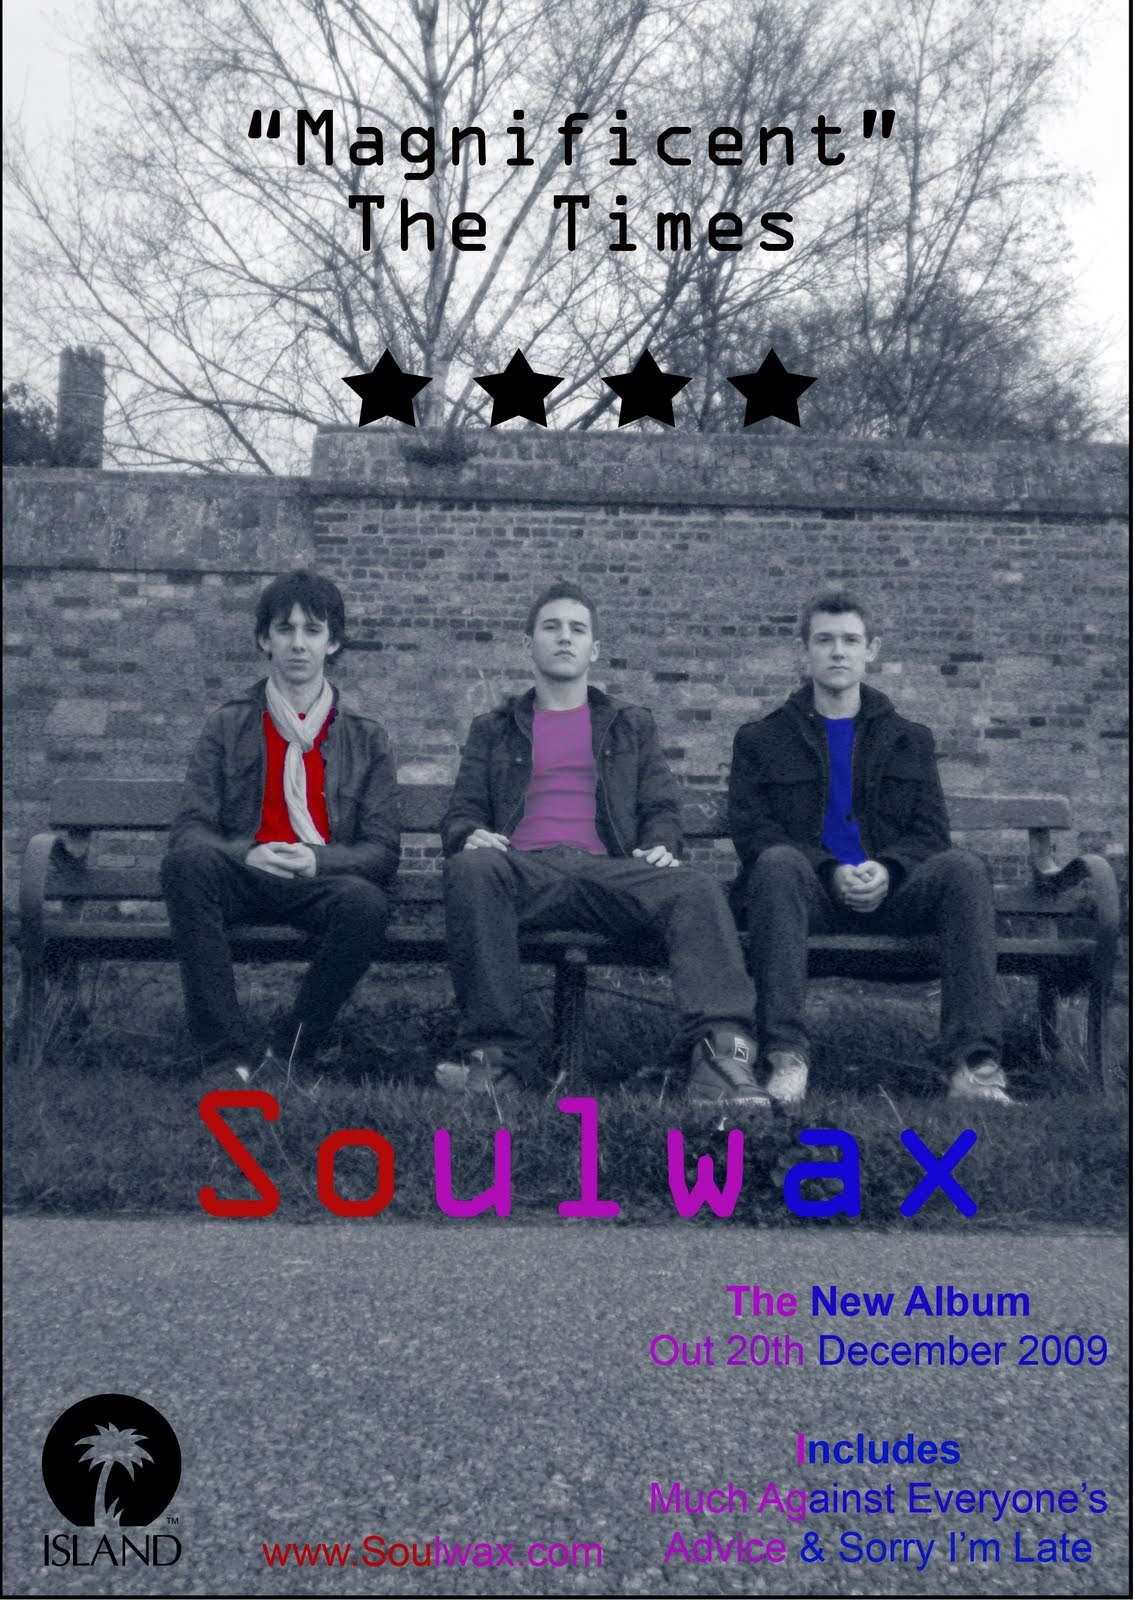 GROUP 07 Music Magazine Advert Jpg